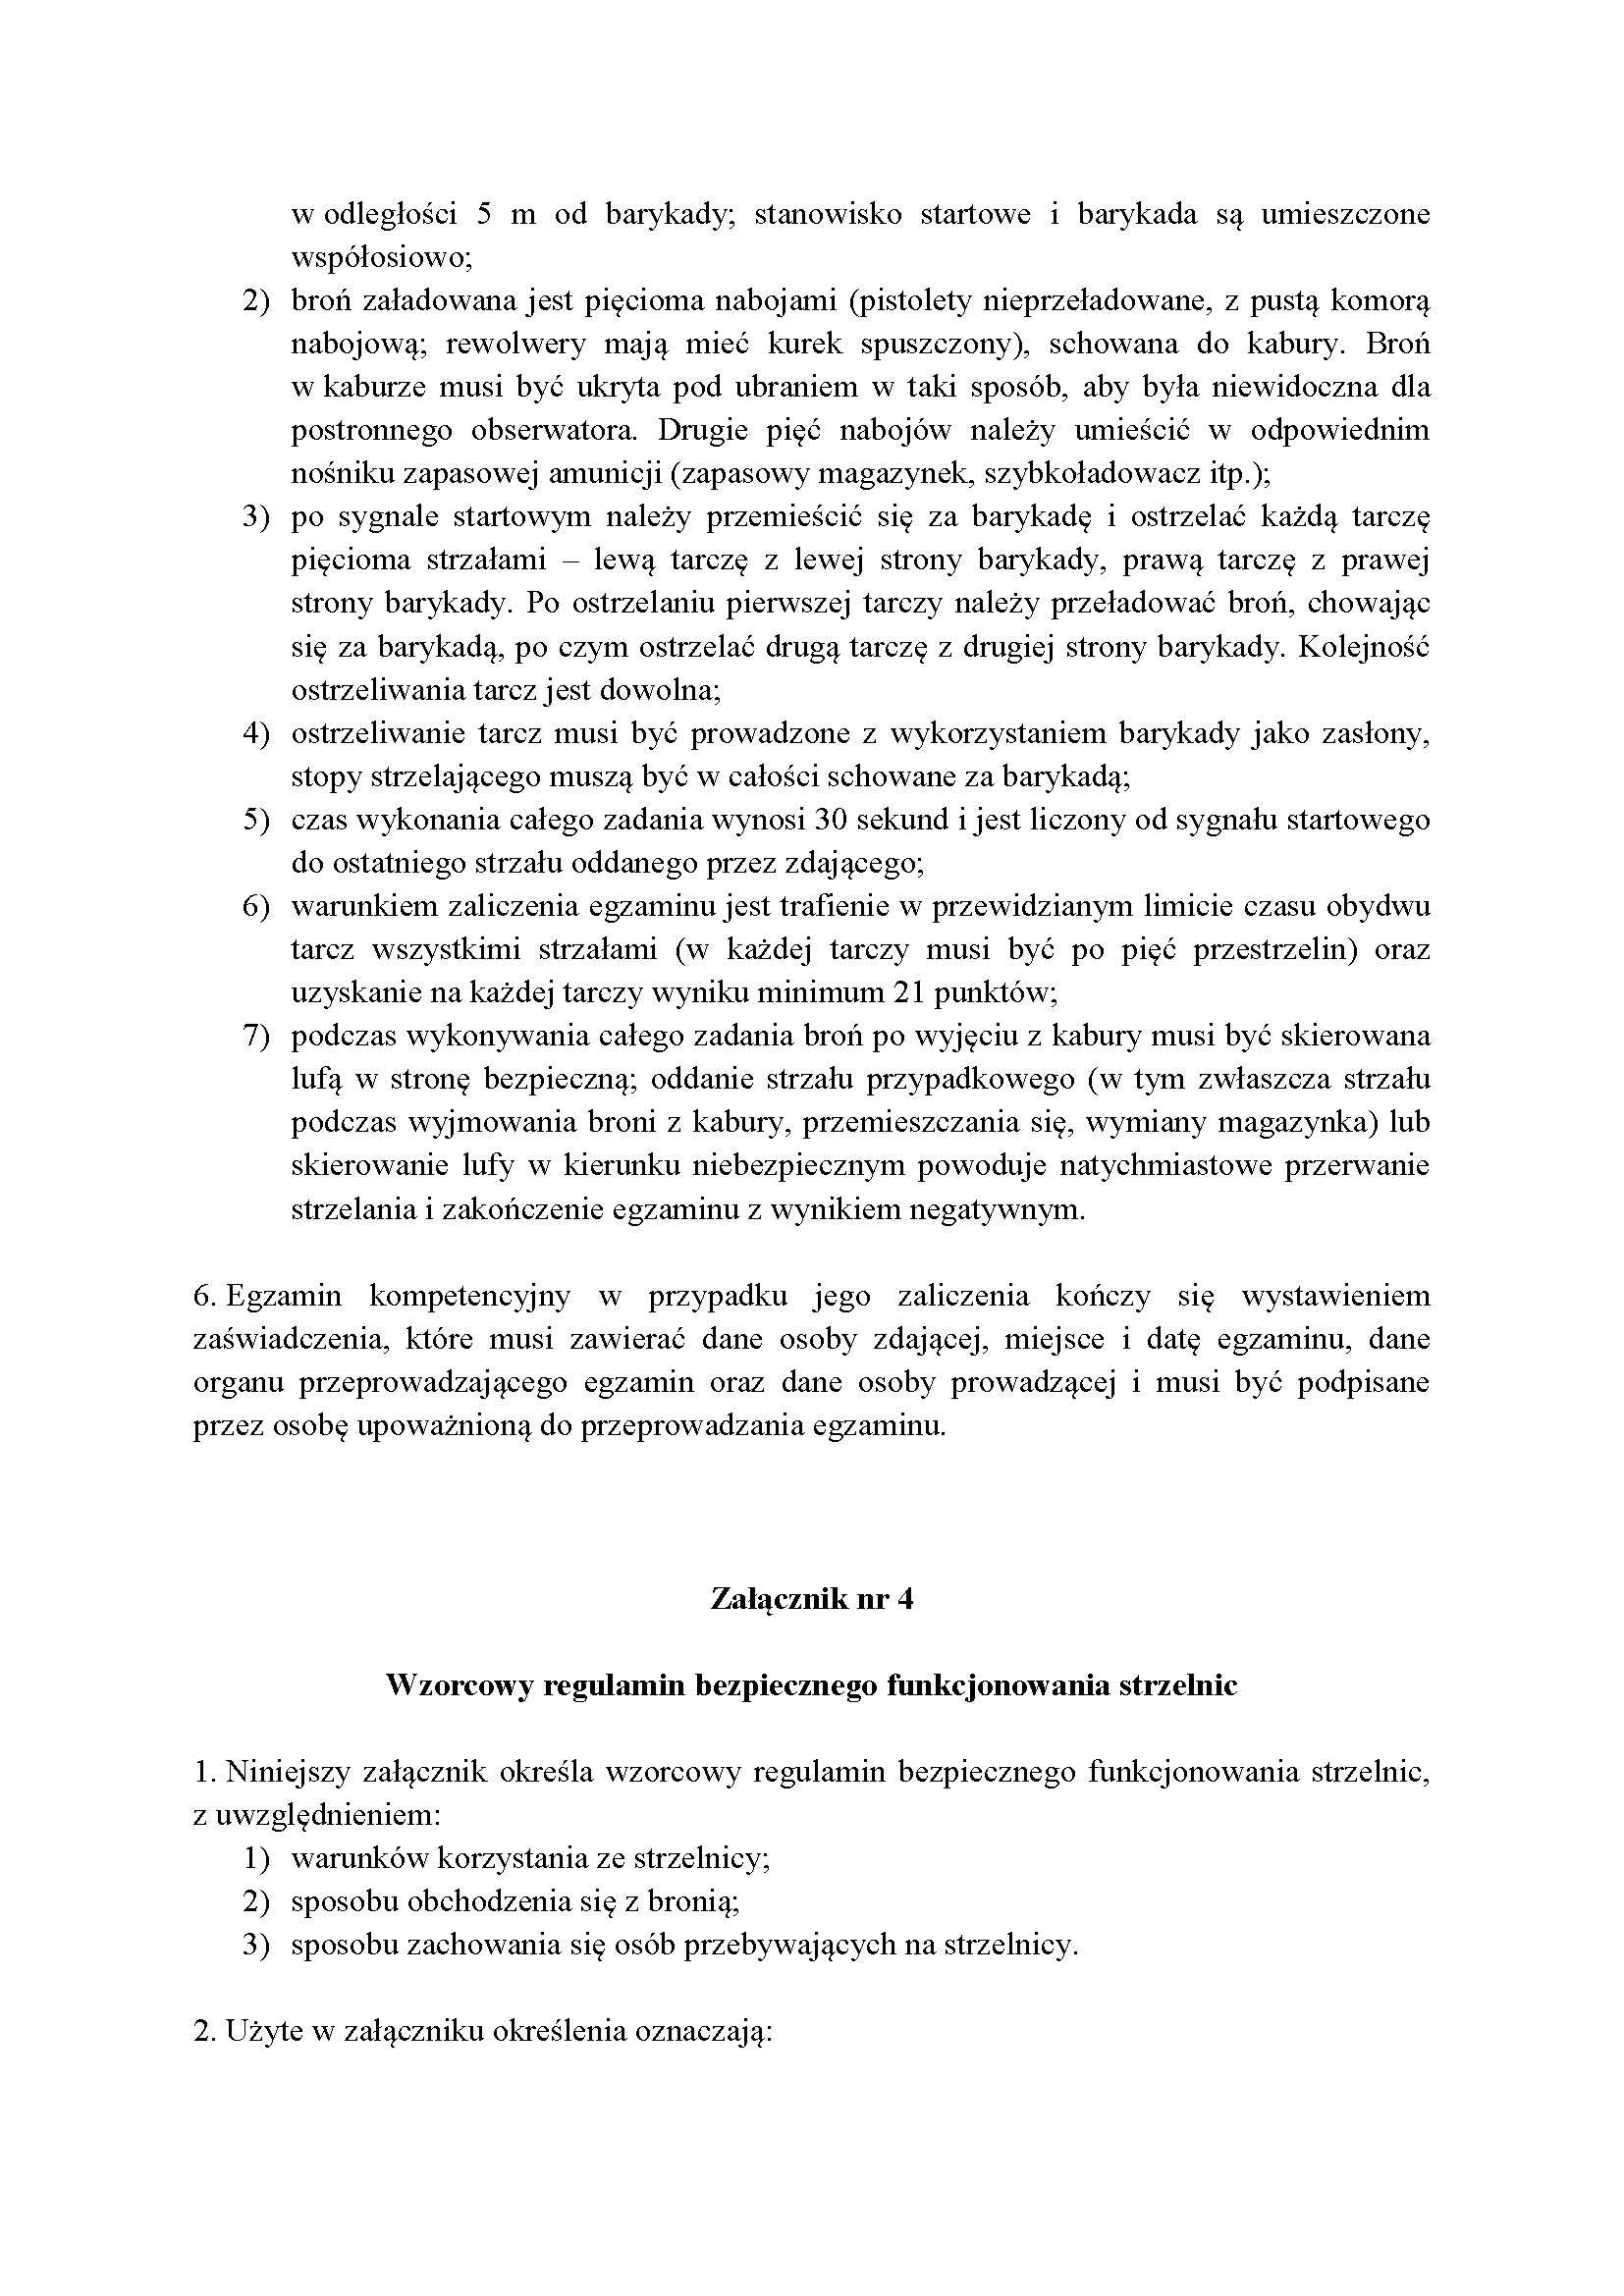 FRSwP_projekt_ustawy_20151125_Strona_23